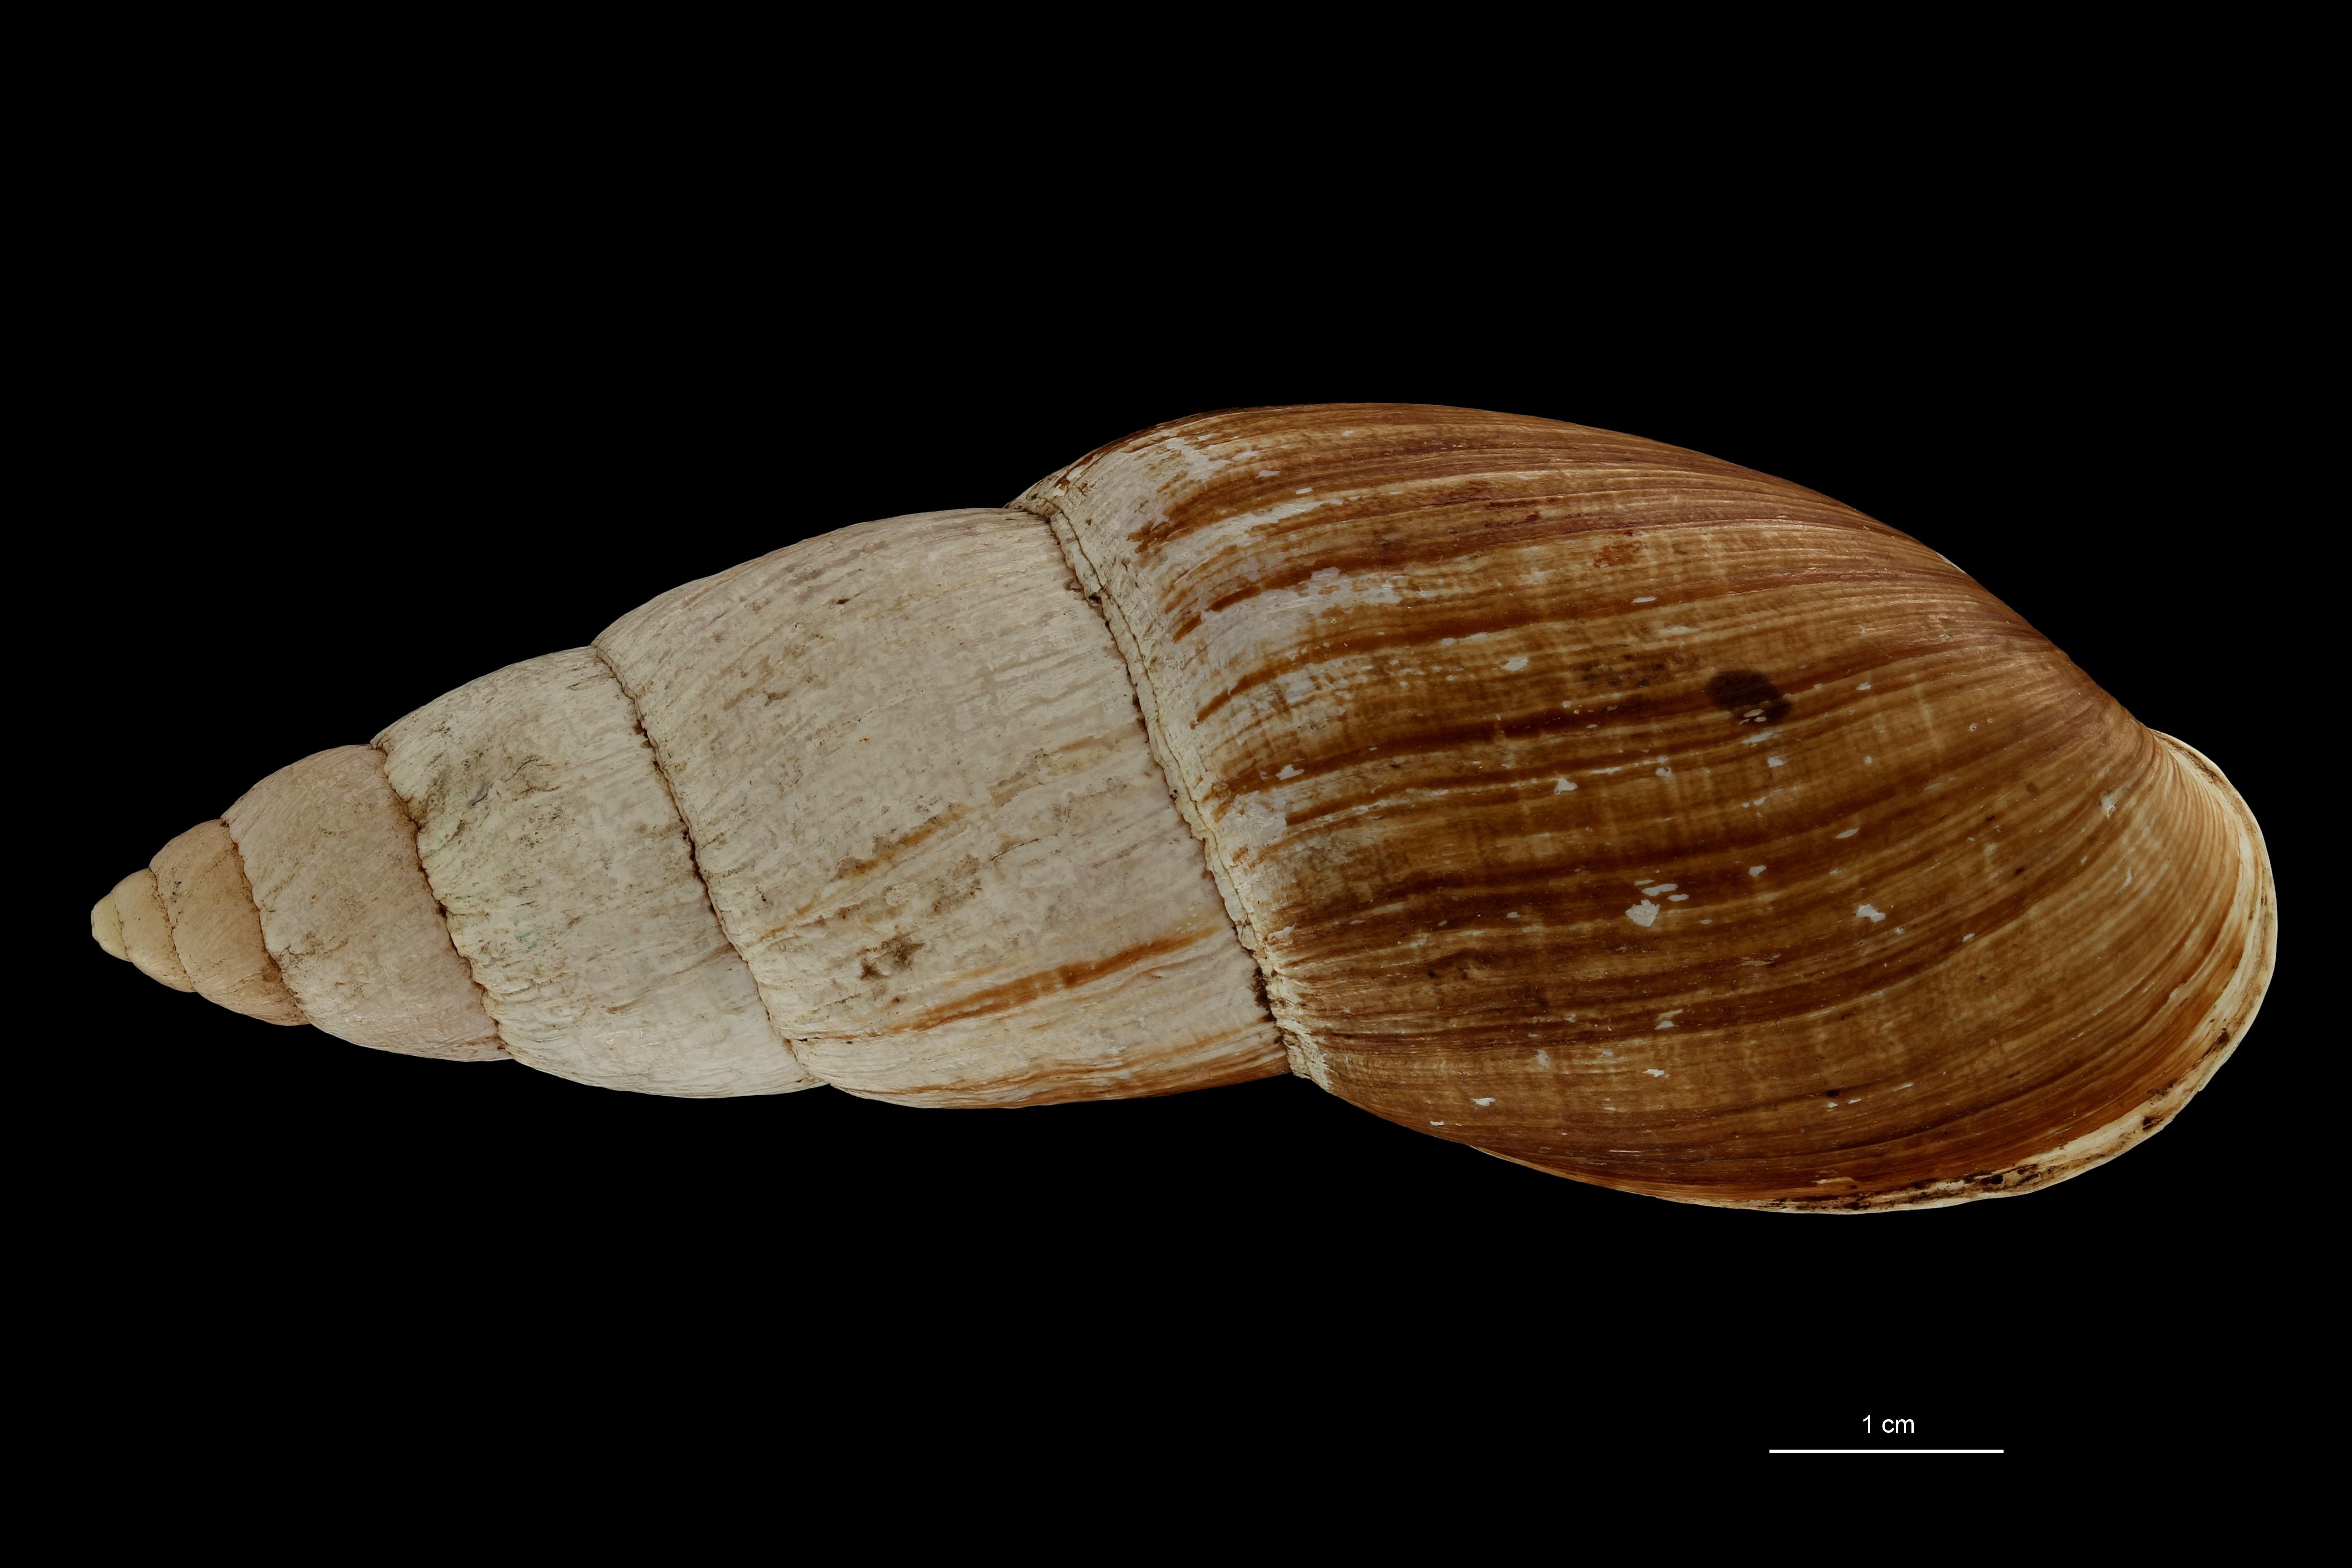 BE-RBINS-INV TYPE MT 705 Placostylus porphyrostomus var. perlonga DORSAL ZS PMax Scaled.jpg